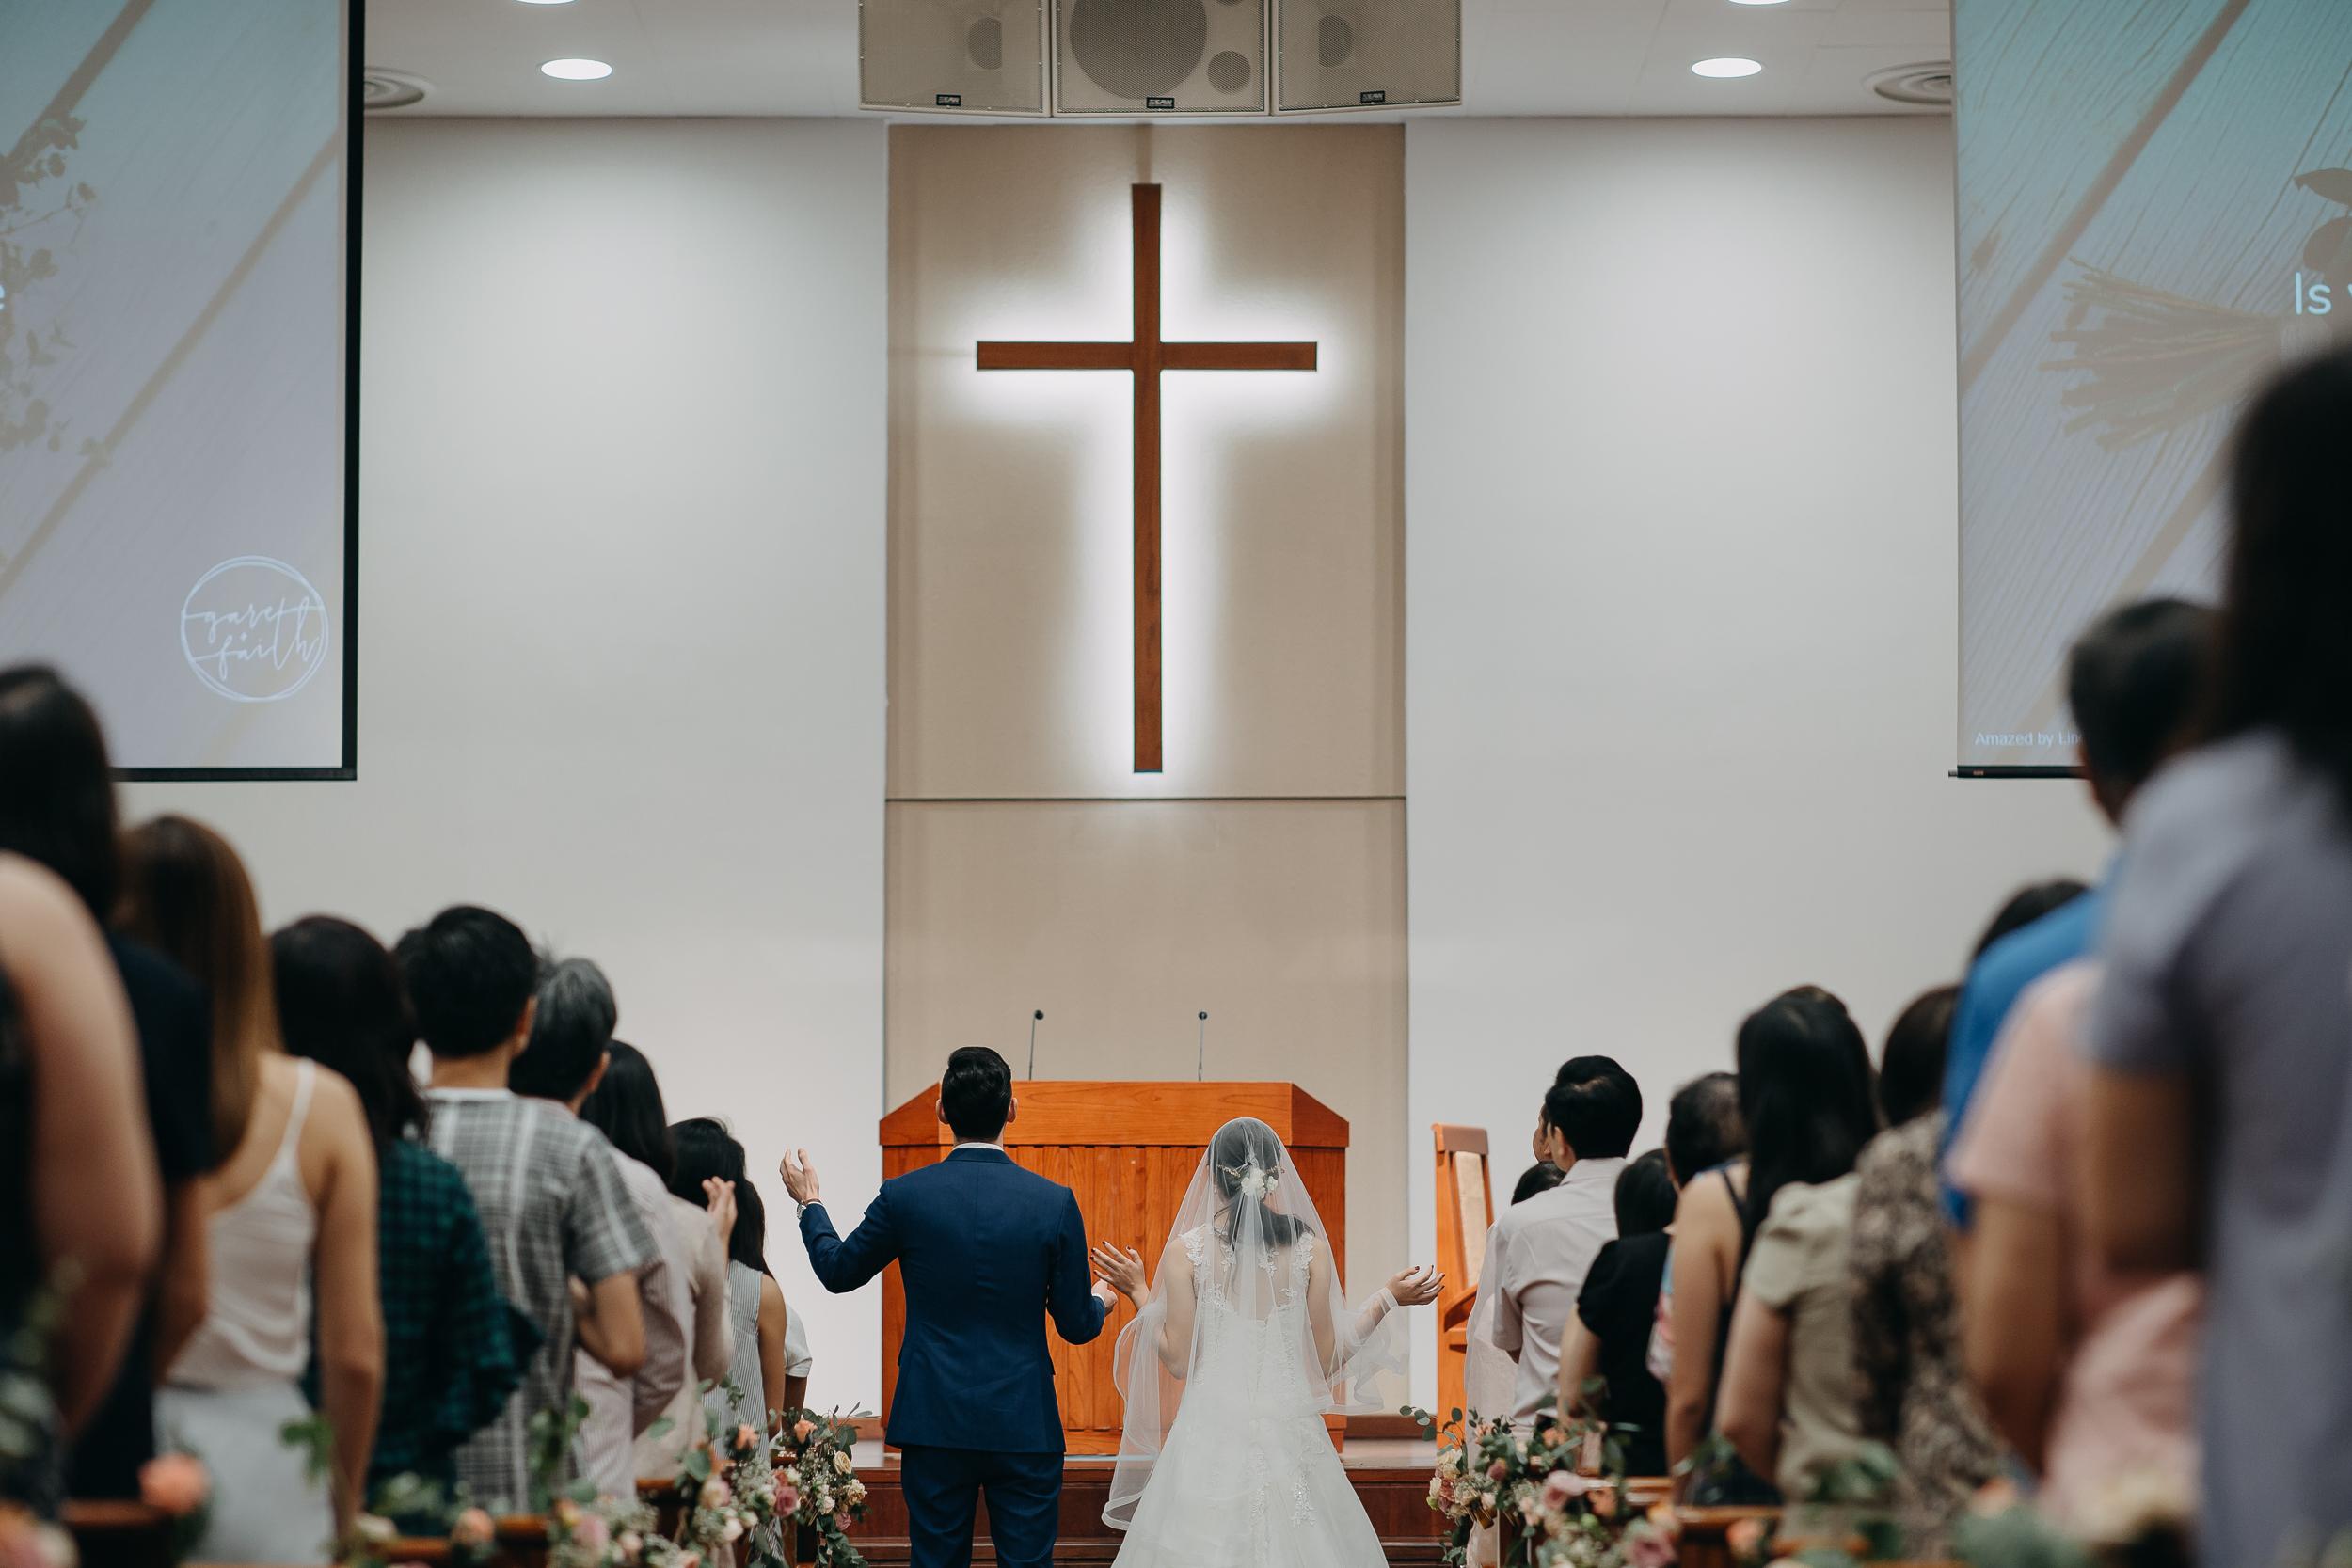 Singapore+Actual+Day+Wedding+Photographer+Min+Jiang+Rochester+Gareth+Faith--0032.jpg